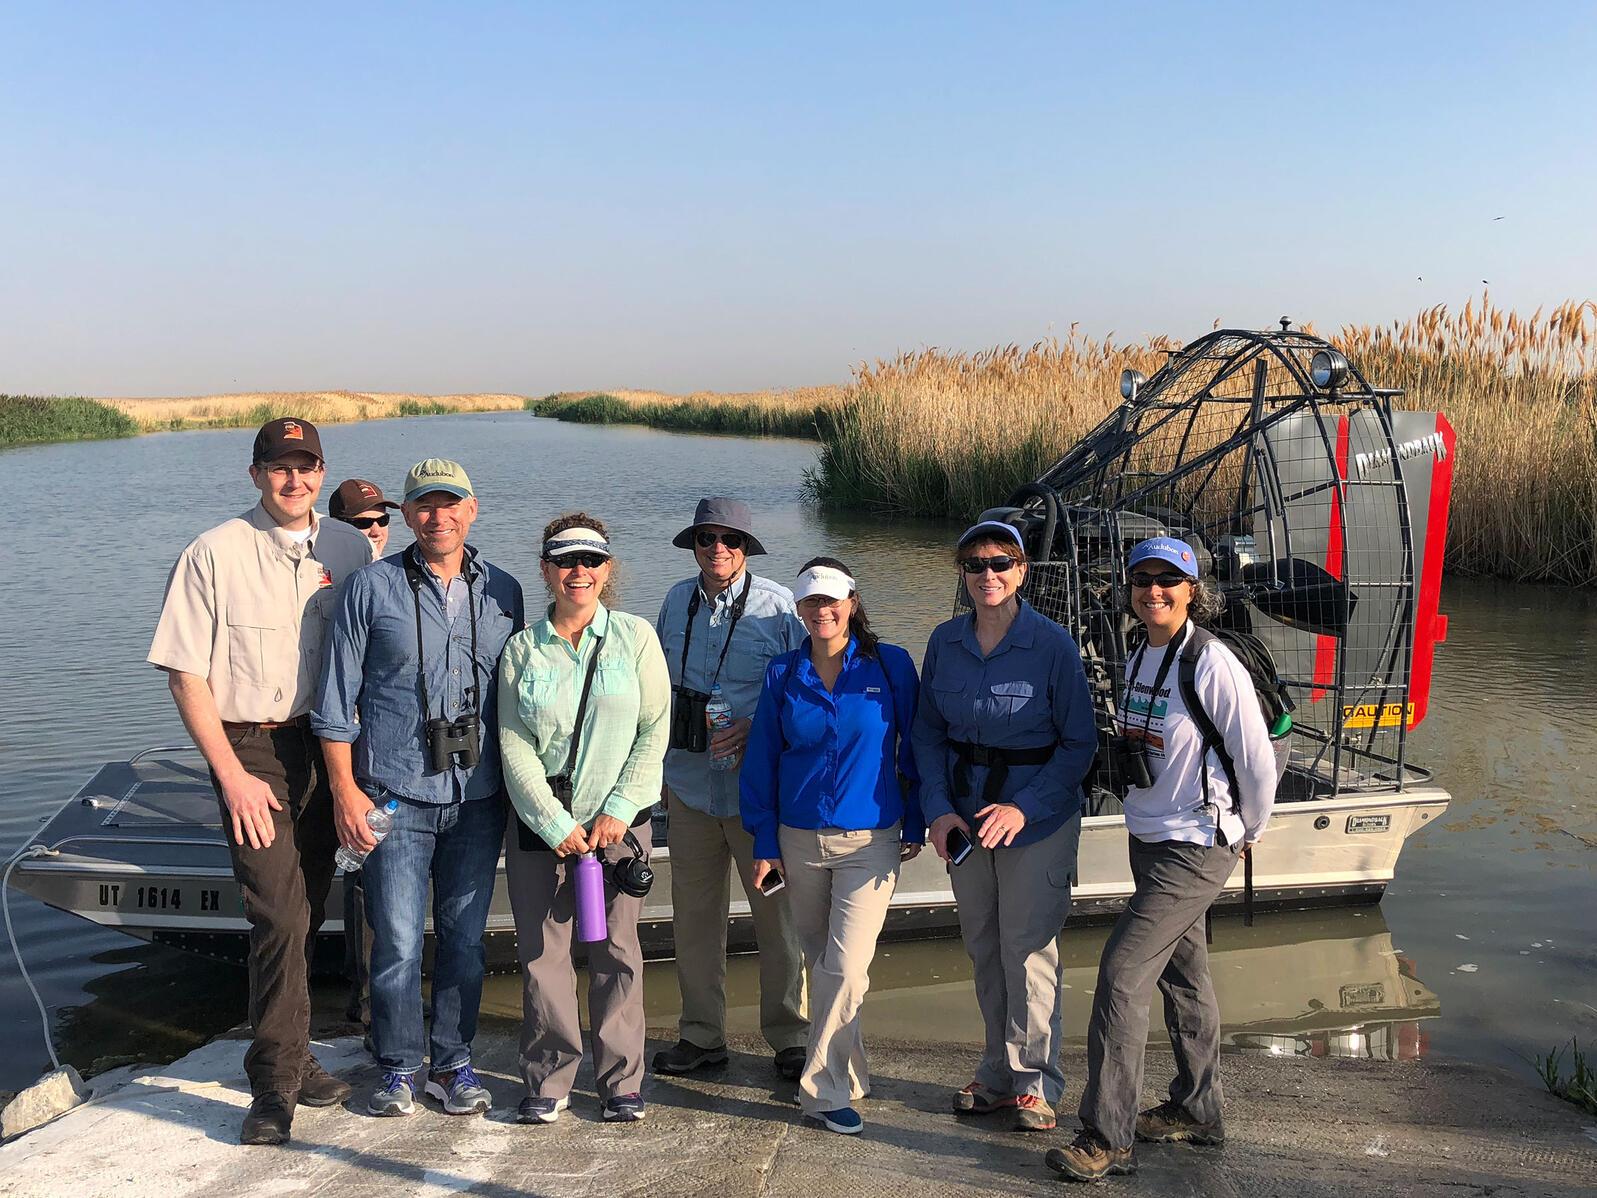 Utah Division of Wildlife Resources and Audubon visit Farmington Bay, one of five Important Bird Areas at Great Salt Lake. Lisa Hardaway/Audubon